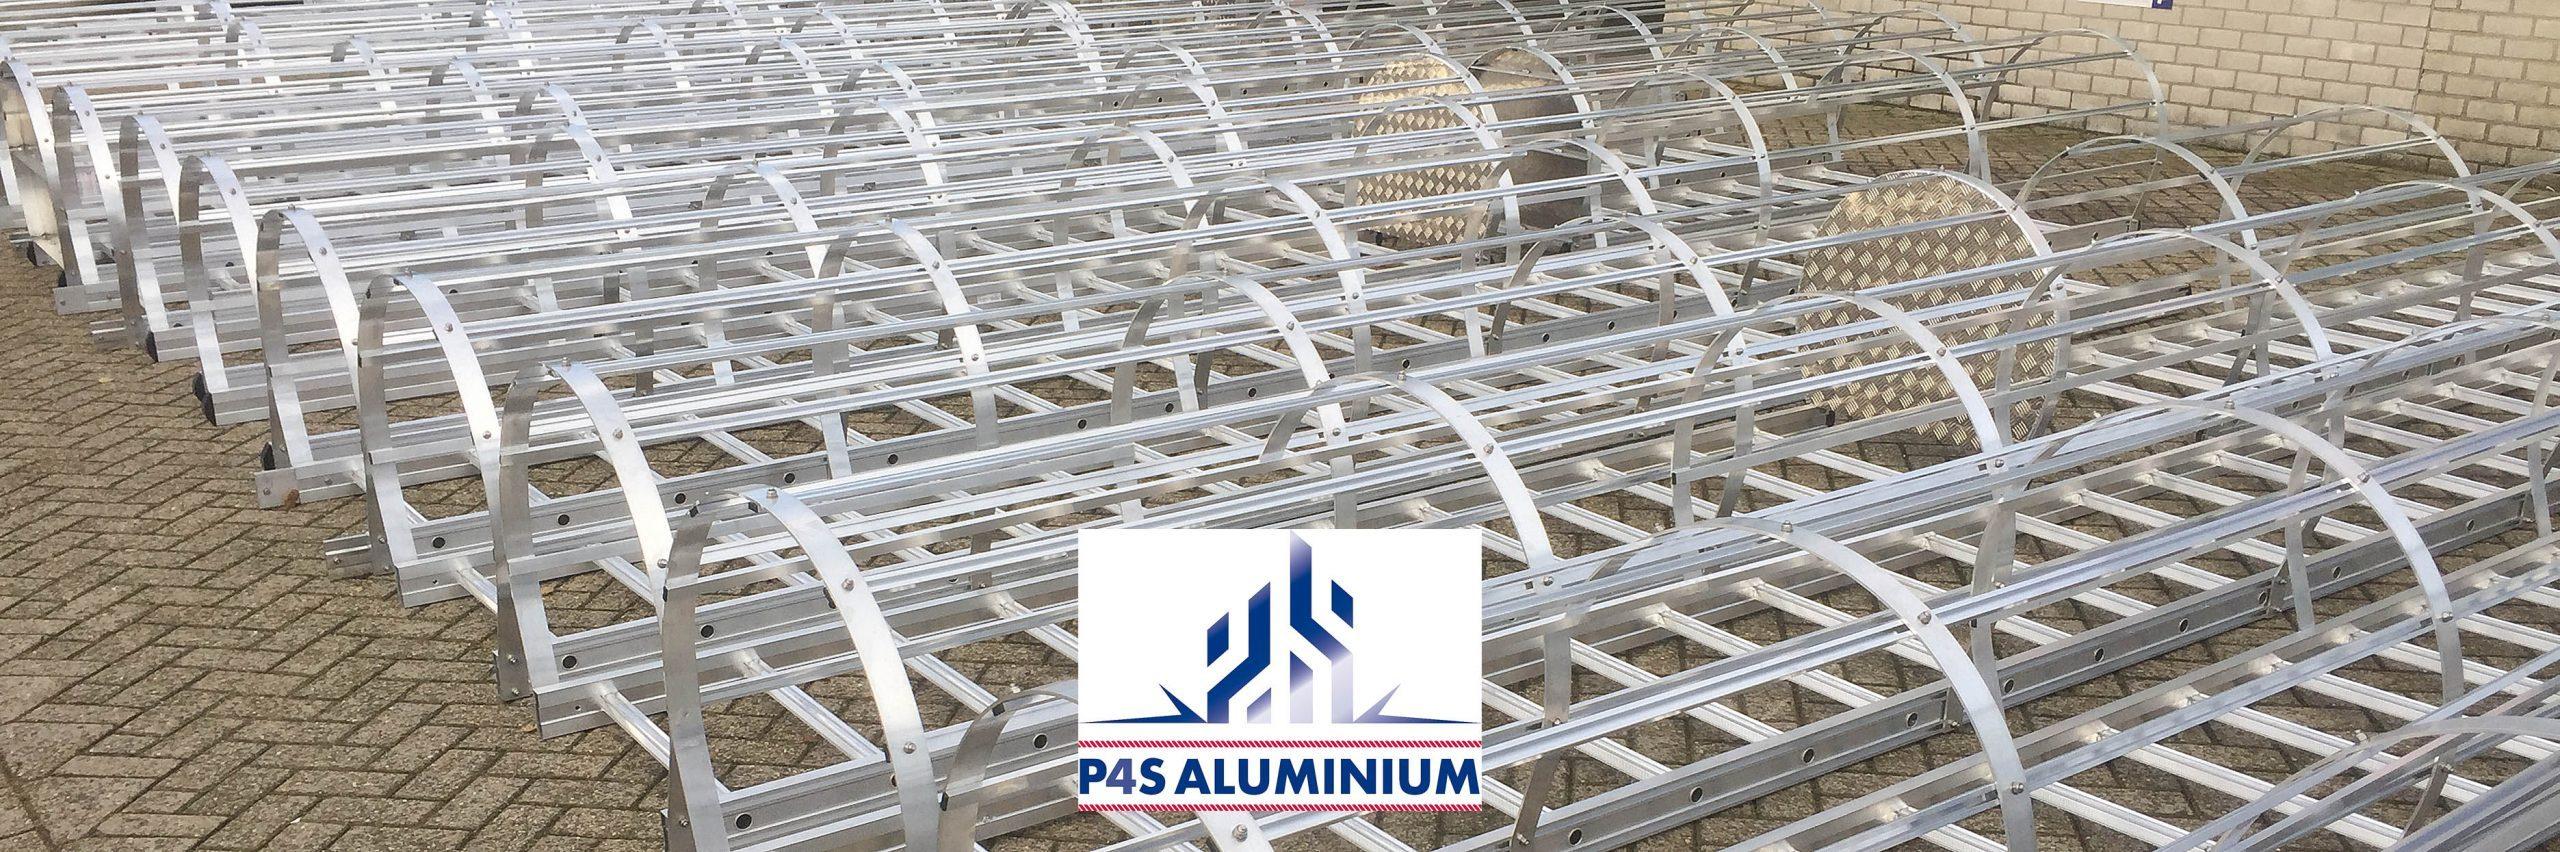 P4S Aluminium kooiladders